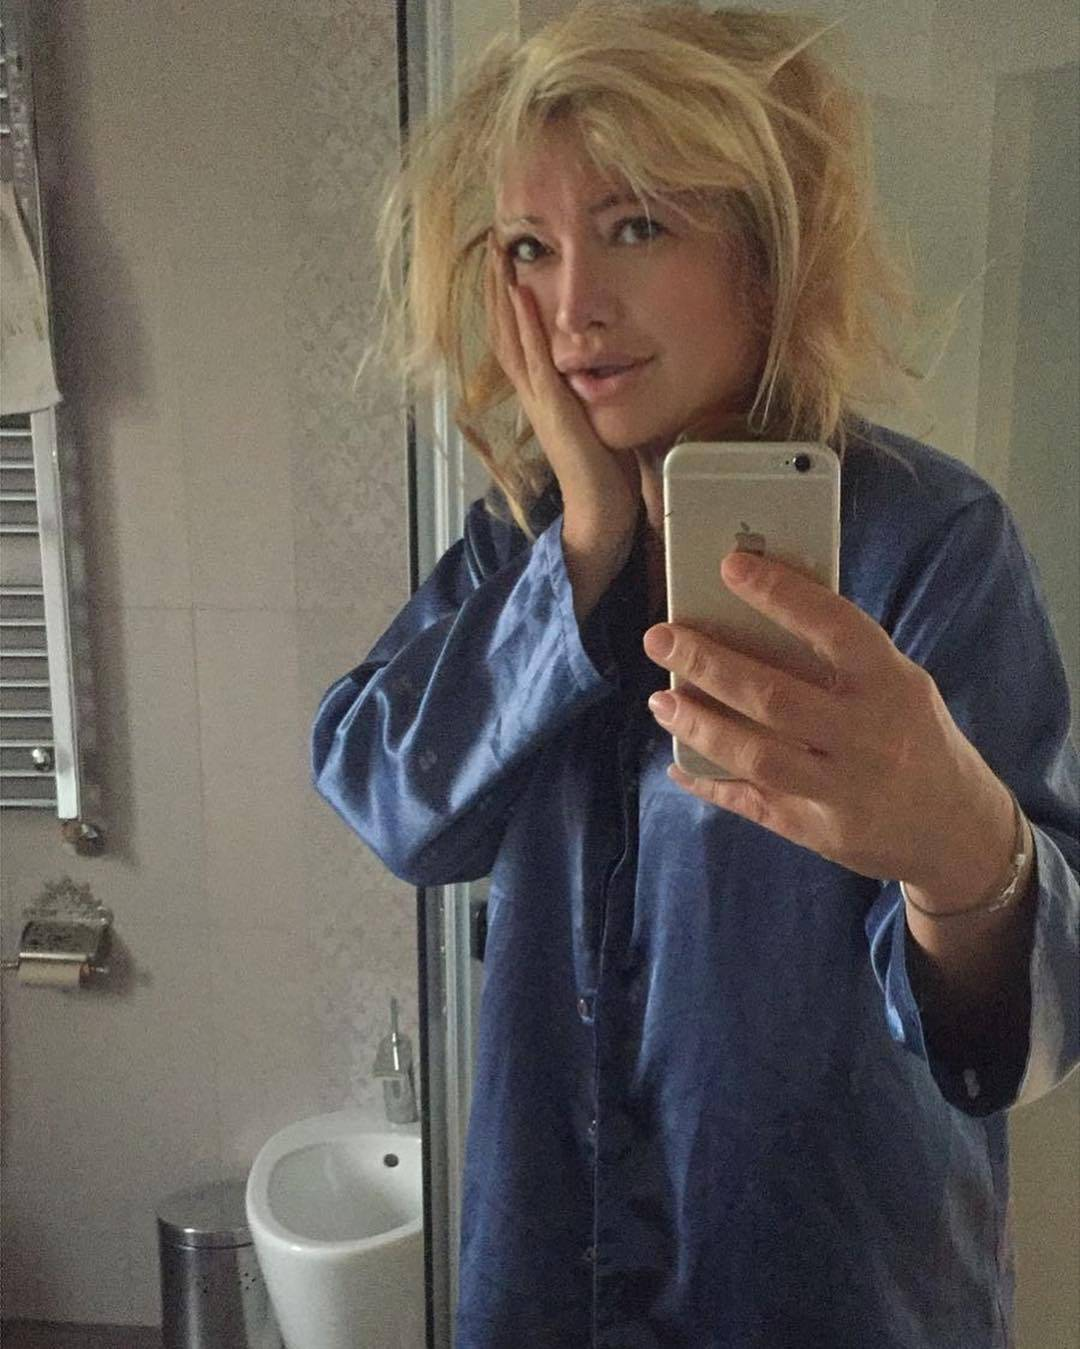 Snježana Mehun: Prepala sam se same sebe jutros u ogledalu